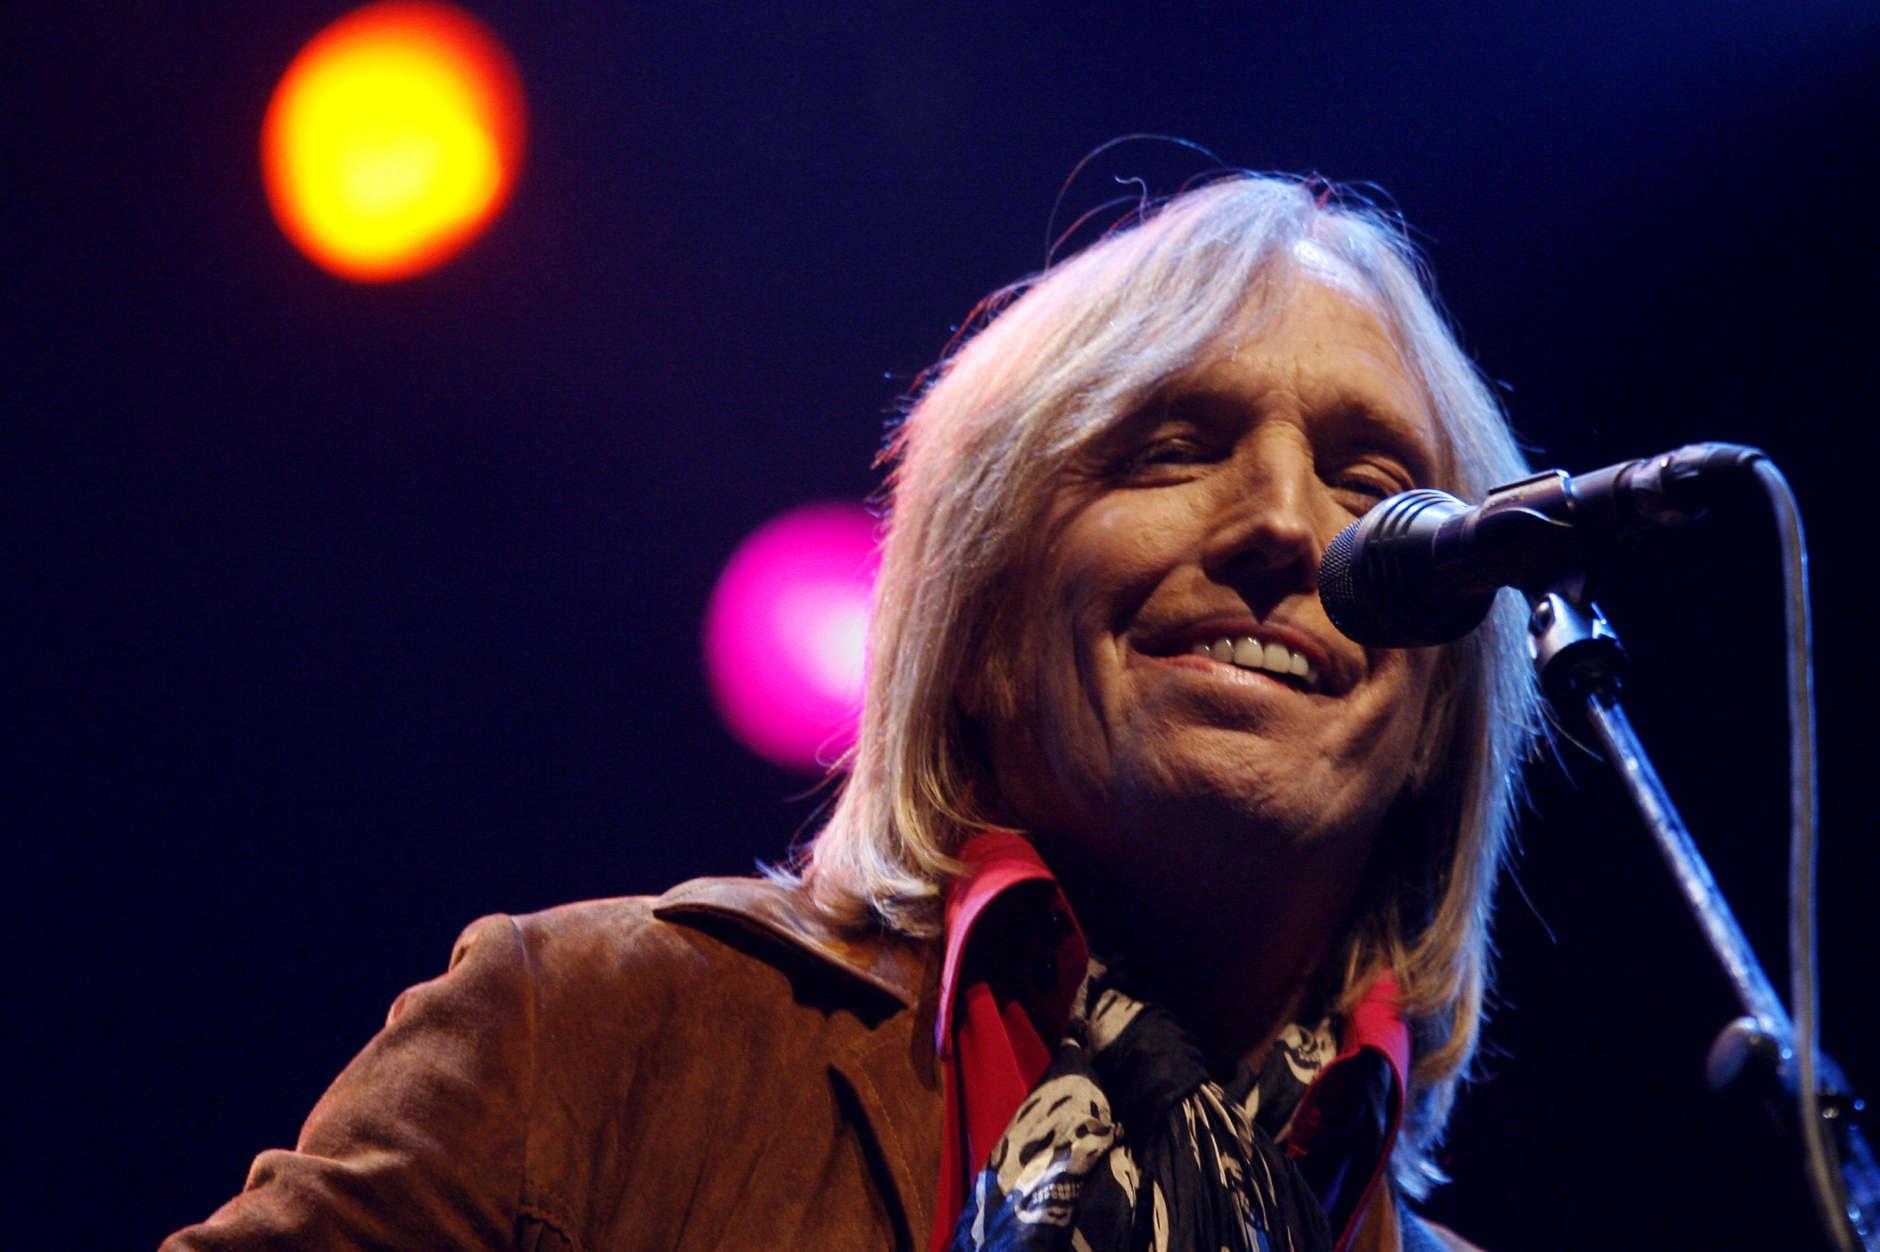 Tom Petty performs during the Vegoose music festival at Sam Boyd Stadium in Las Vegas on Saturday, Oct. 28, 2006. (AP Photo/Isaac Brekken)